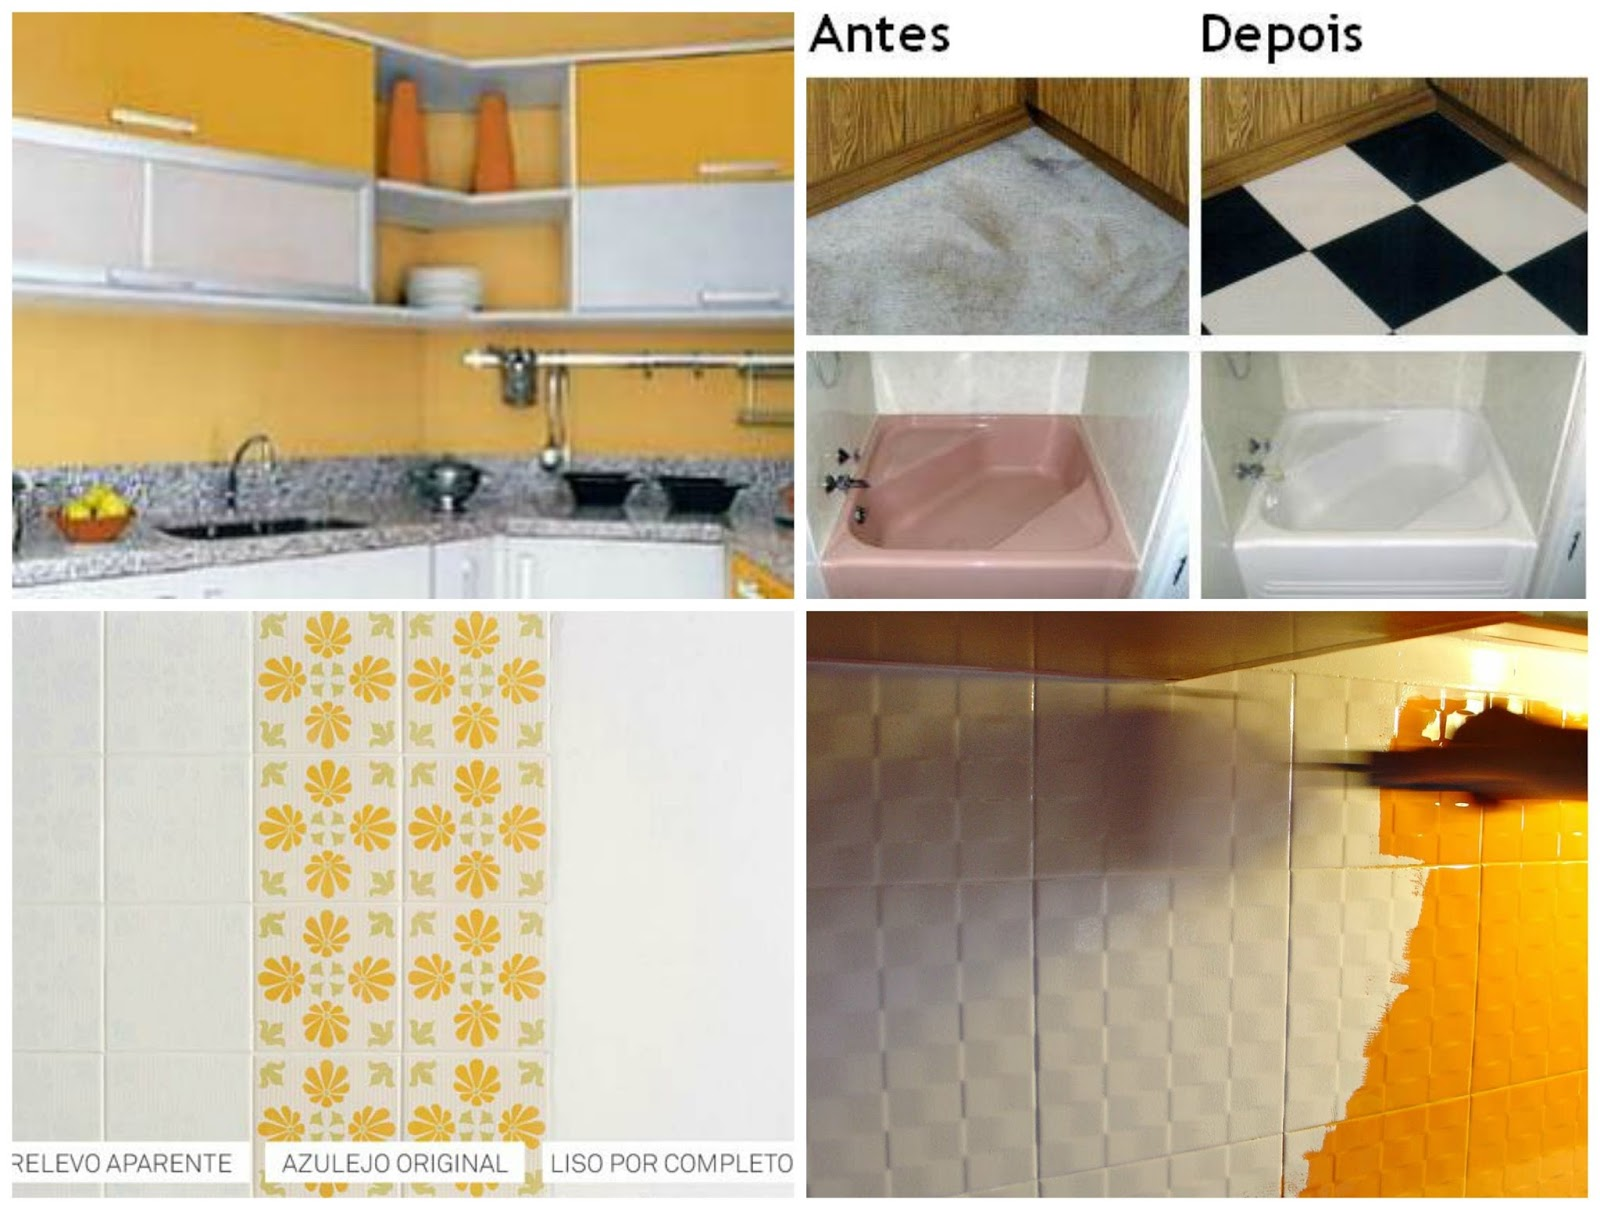 Dicas de como pintar azulejos mari beleza pura - Pintura para azulejos de bano ...